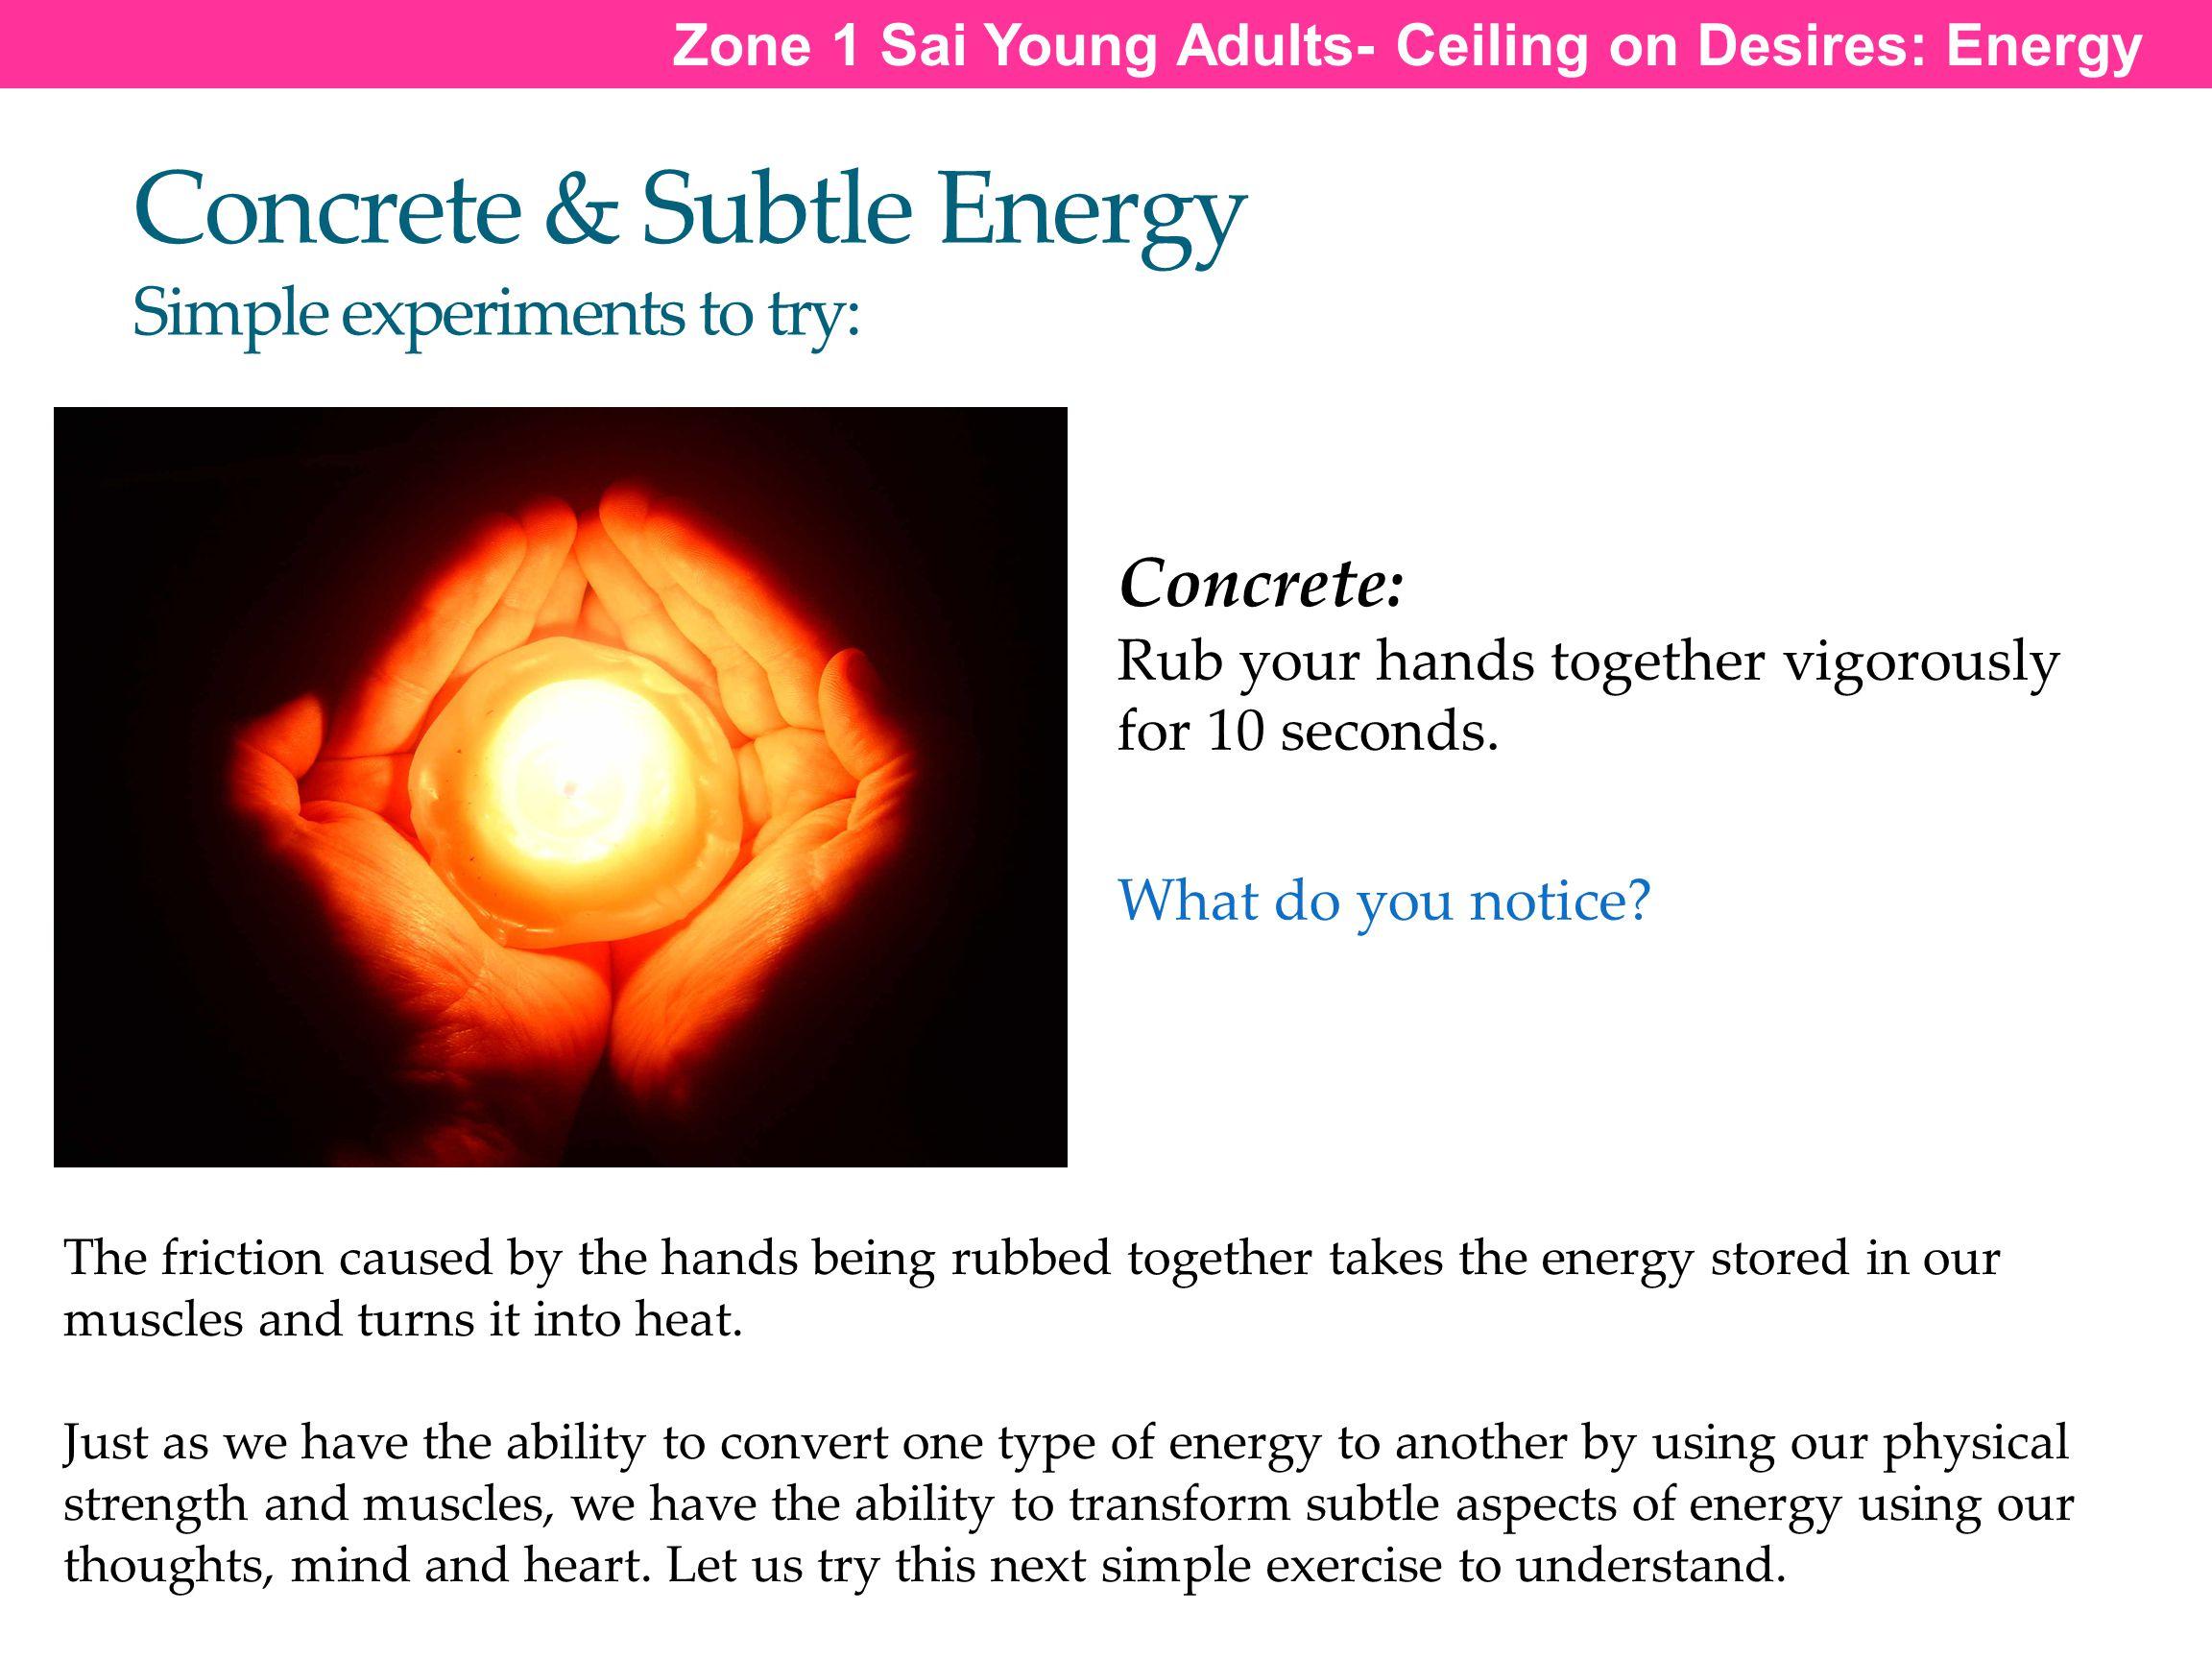 Concrete & Subtle Energy Simple experiments to try: